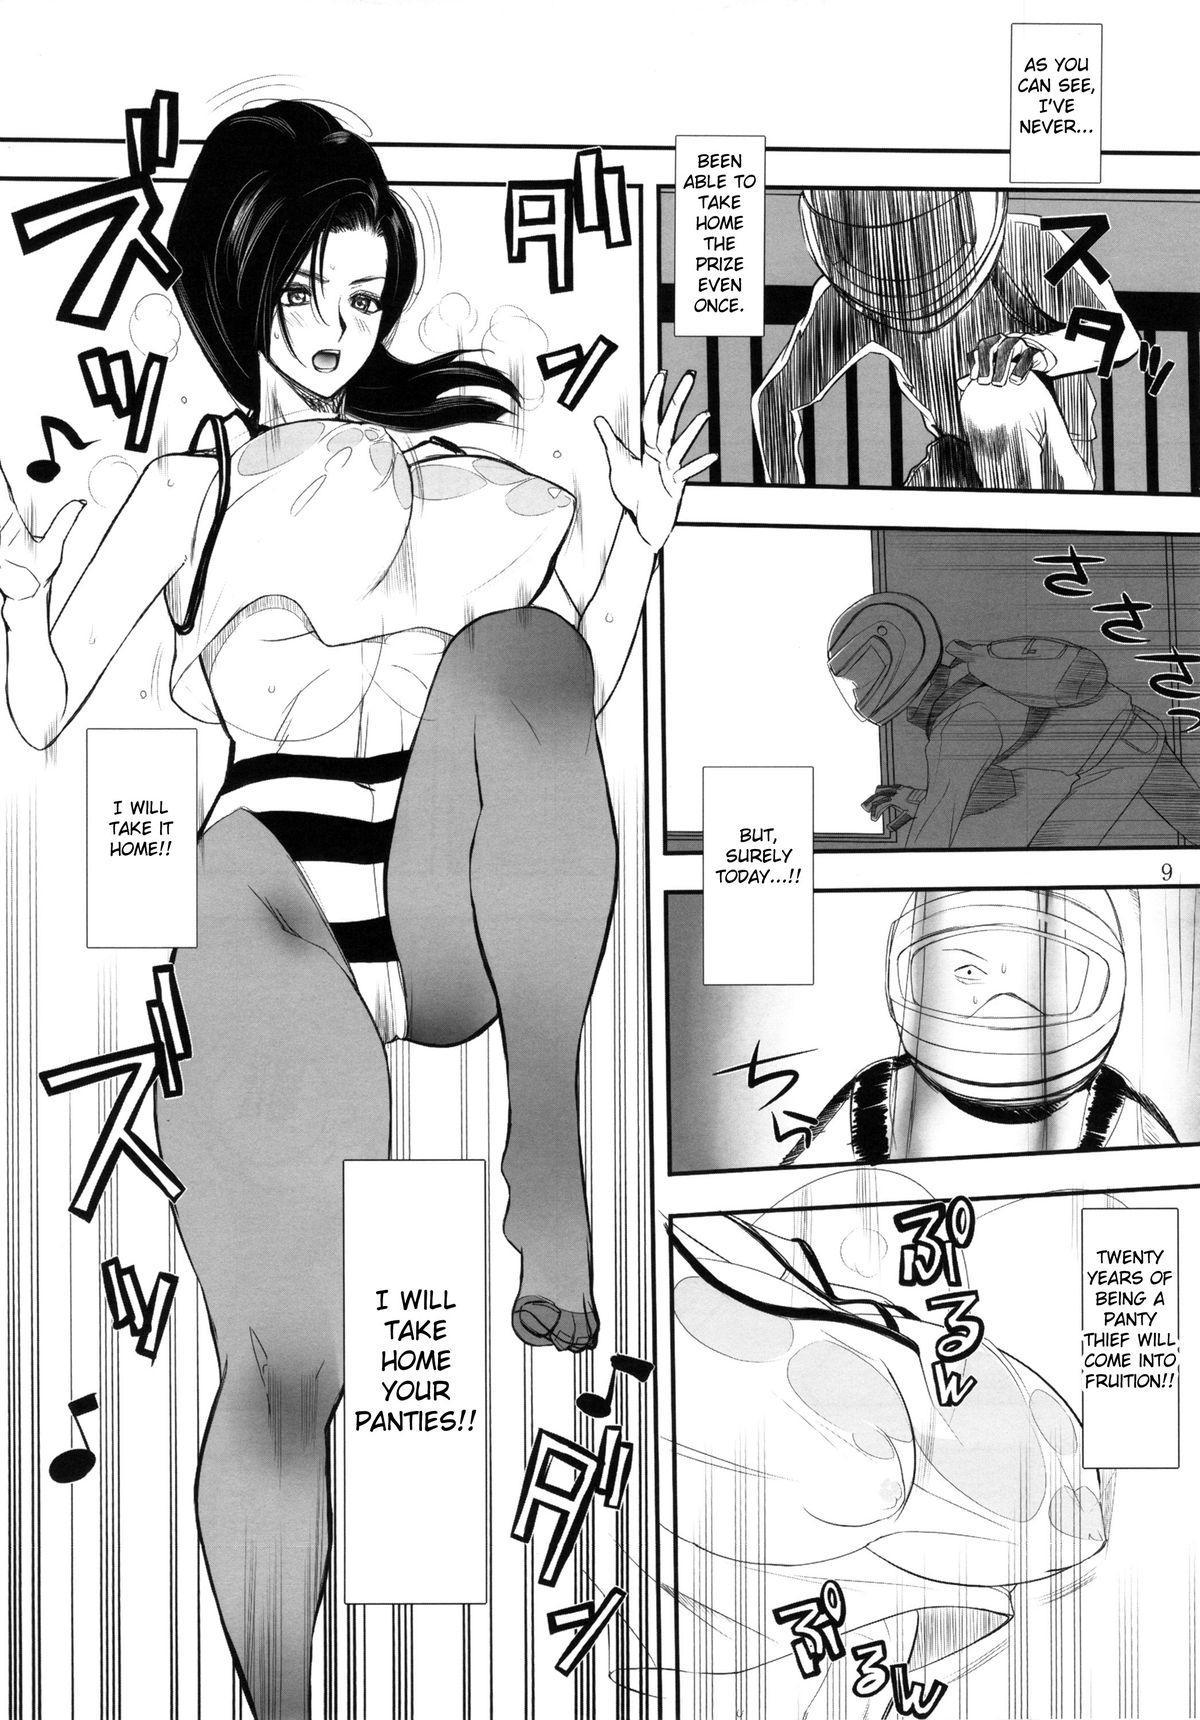 (COMIC1☆8) [G-panda (Midoh Tsukasa)] Maji kayo!? Ooaya-sensei   I Can't Believe It! Ooaya-sensei (Magical Taruruuto-kun) [English] {doujin-moe.us} 7